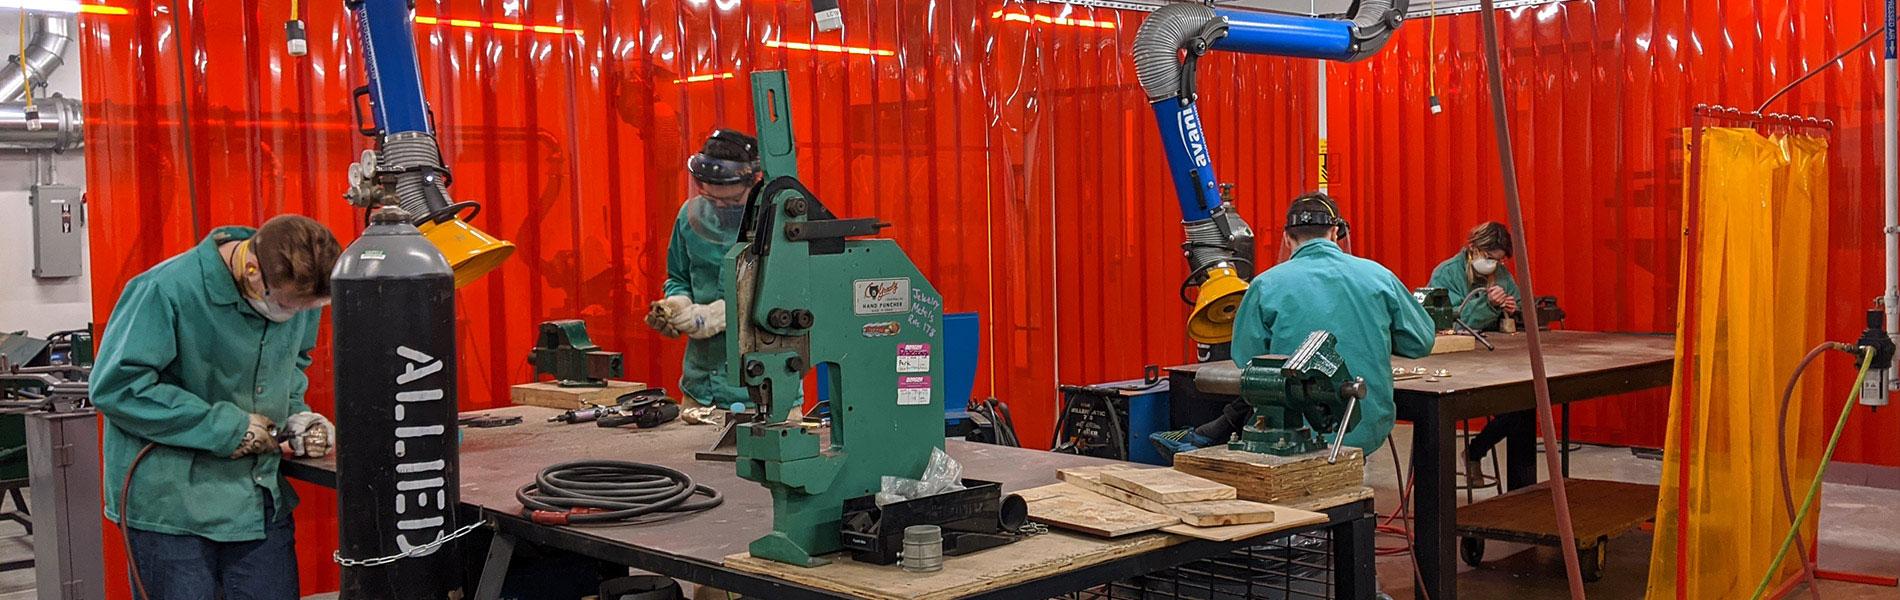 Sculpture Studio - student at work in the metal shop